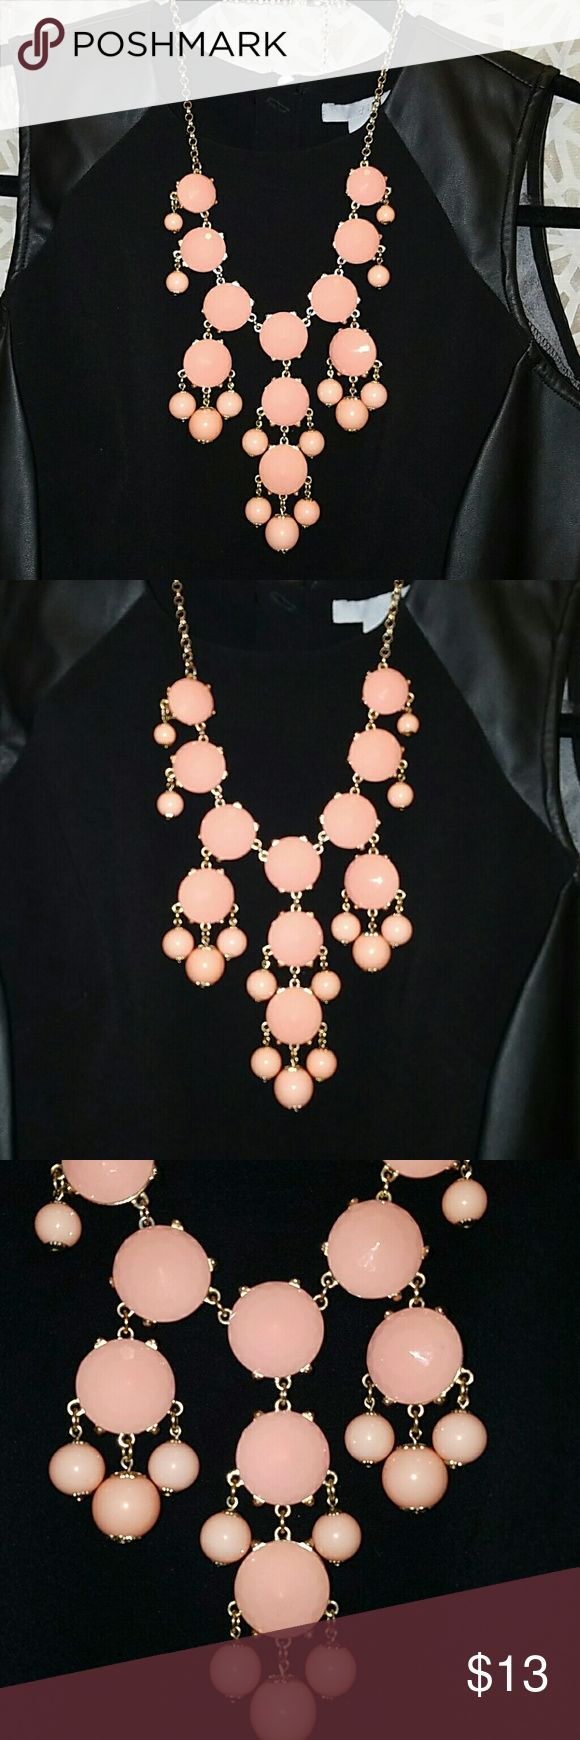 Coral bubble necklace Francescas coral necklace - all one color Francesca's Collections Jewelry Necklaces